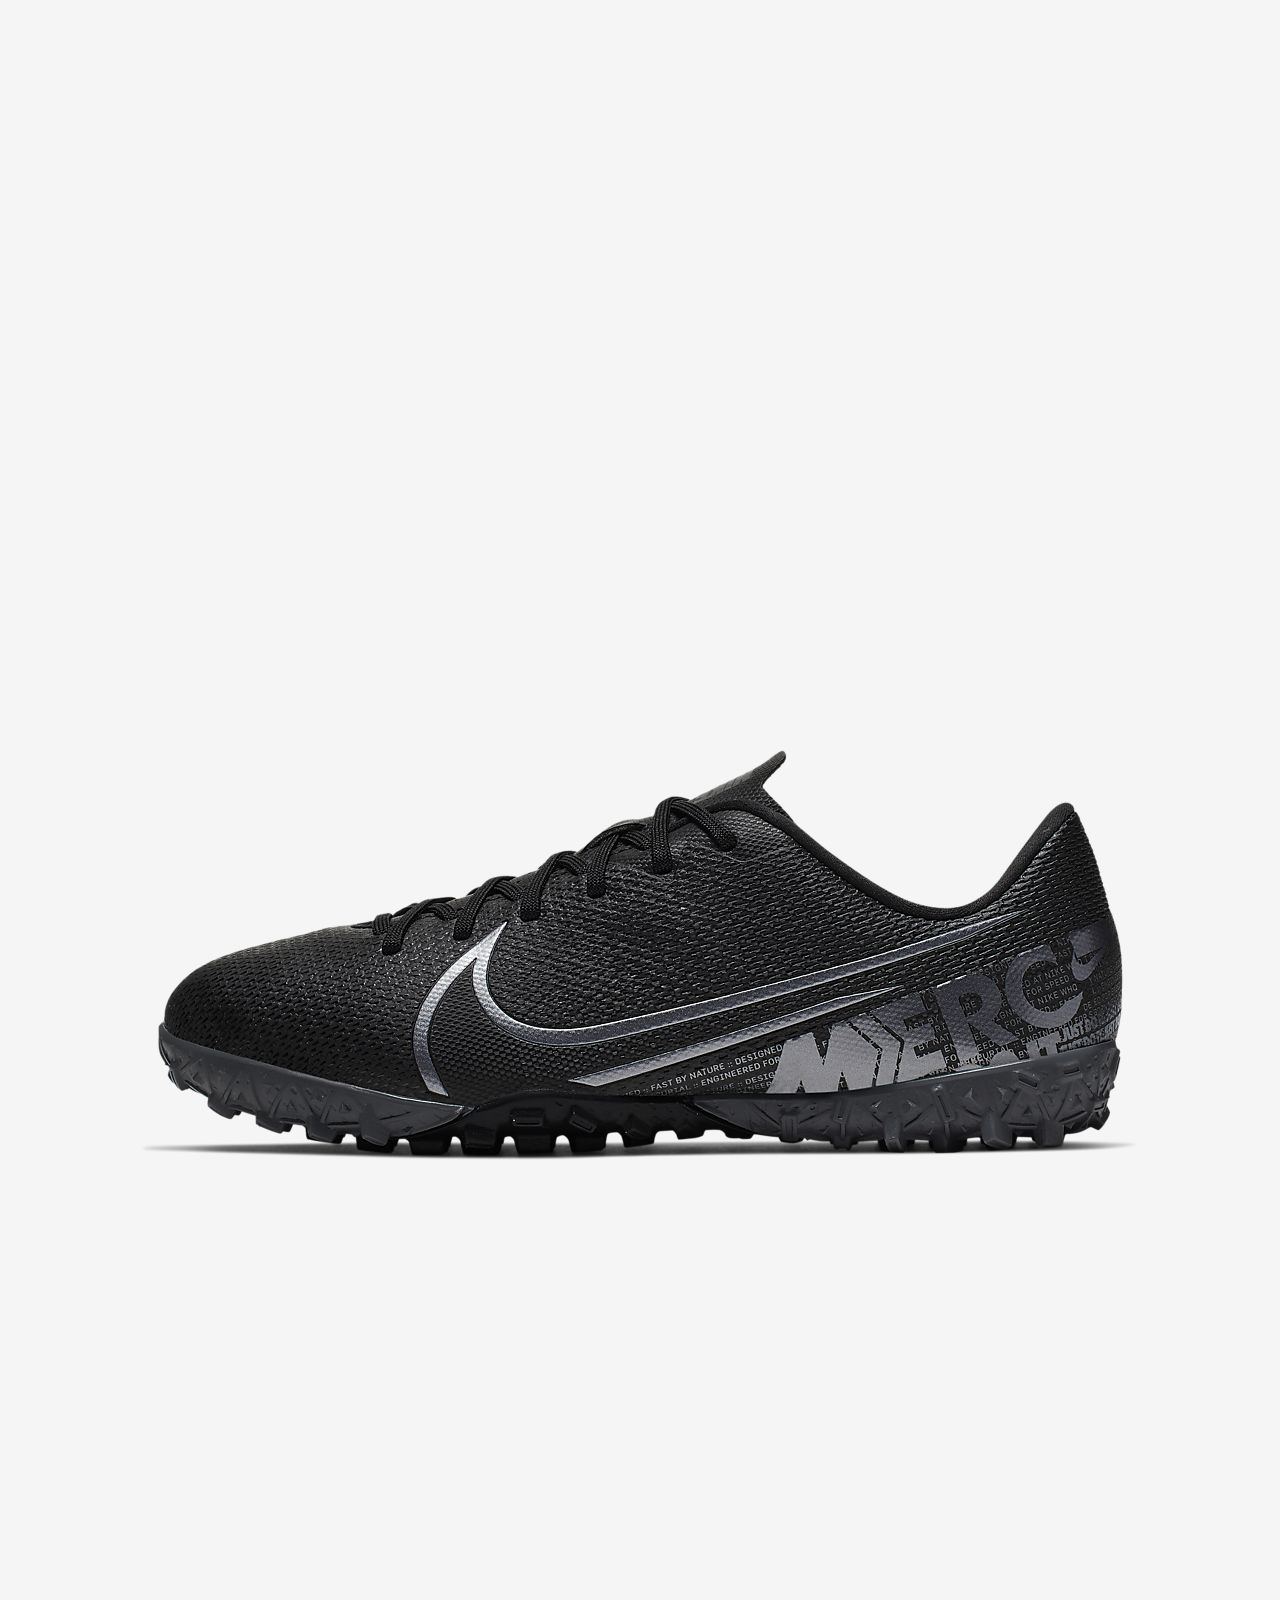 Scarpa da calcio per erba sintetica Nike Jr. Mercurial Vapor 13 Academy TF - Bambini/Ragazzi